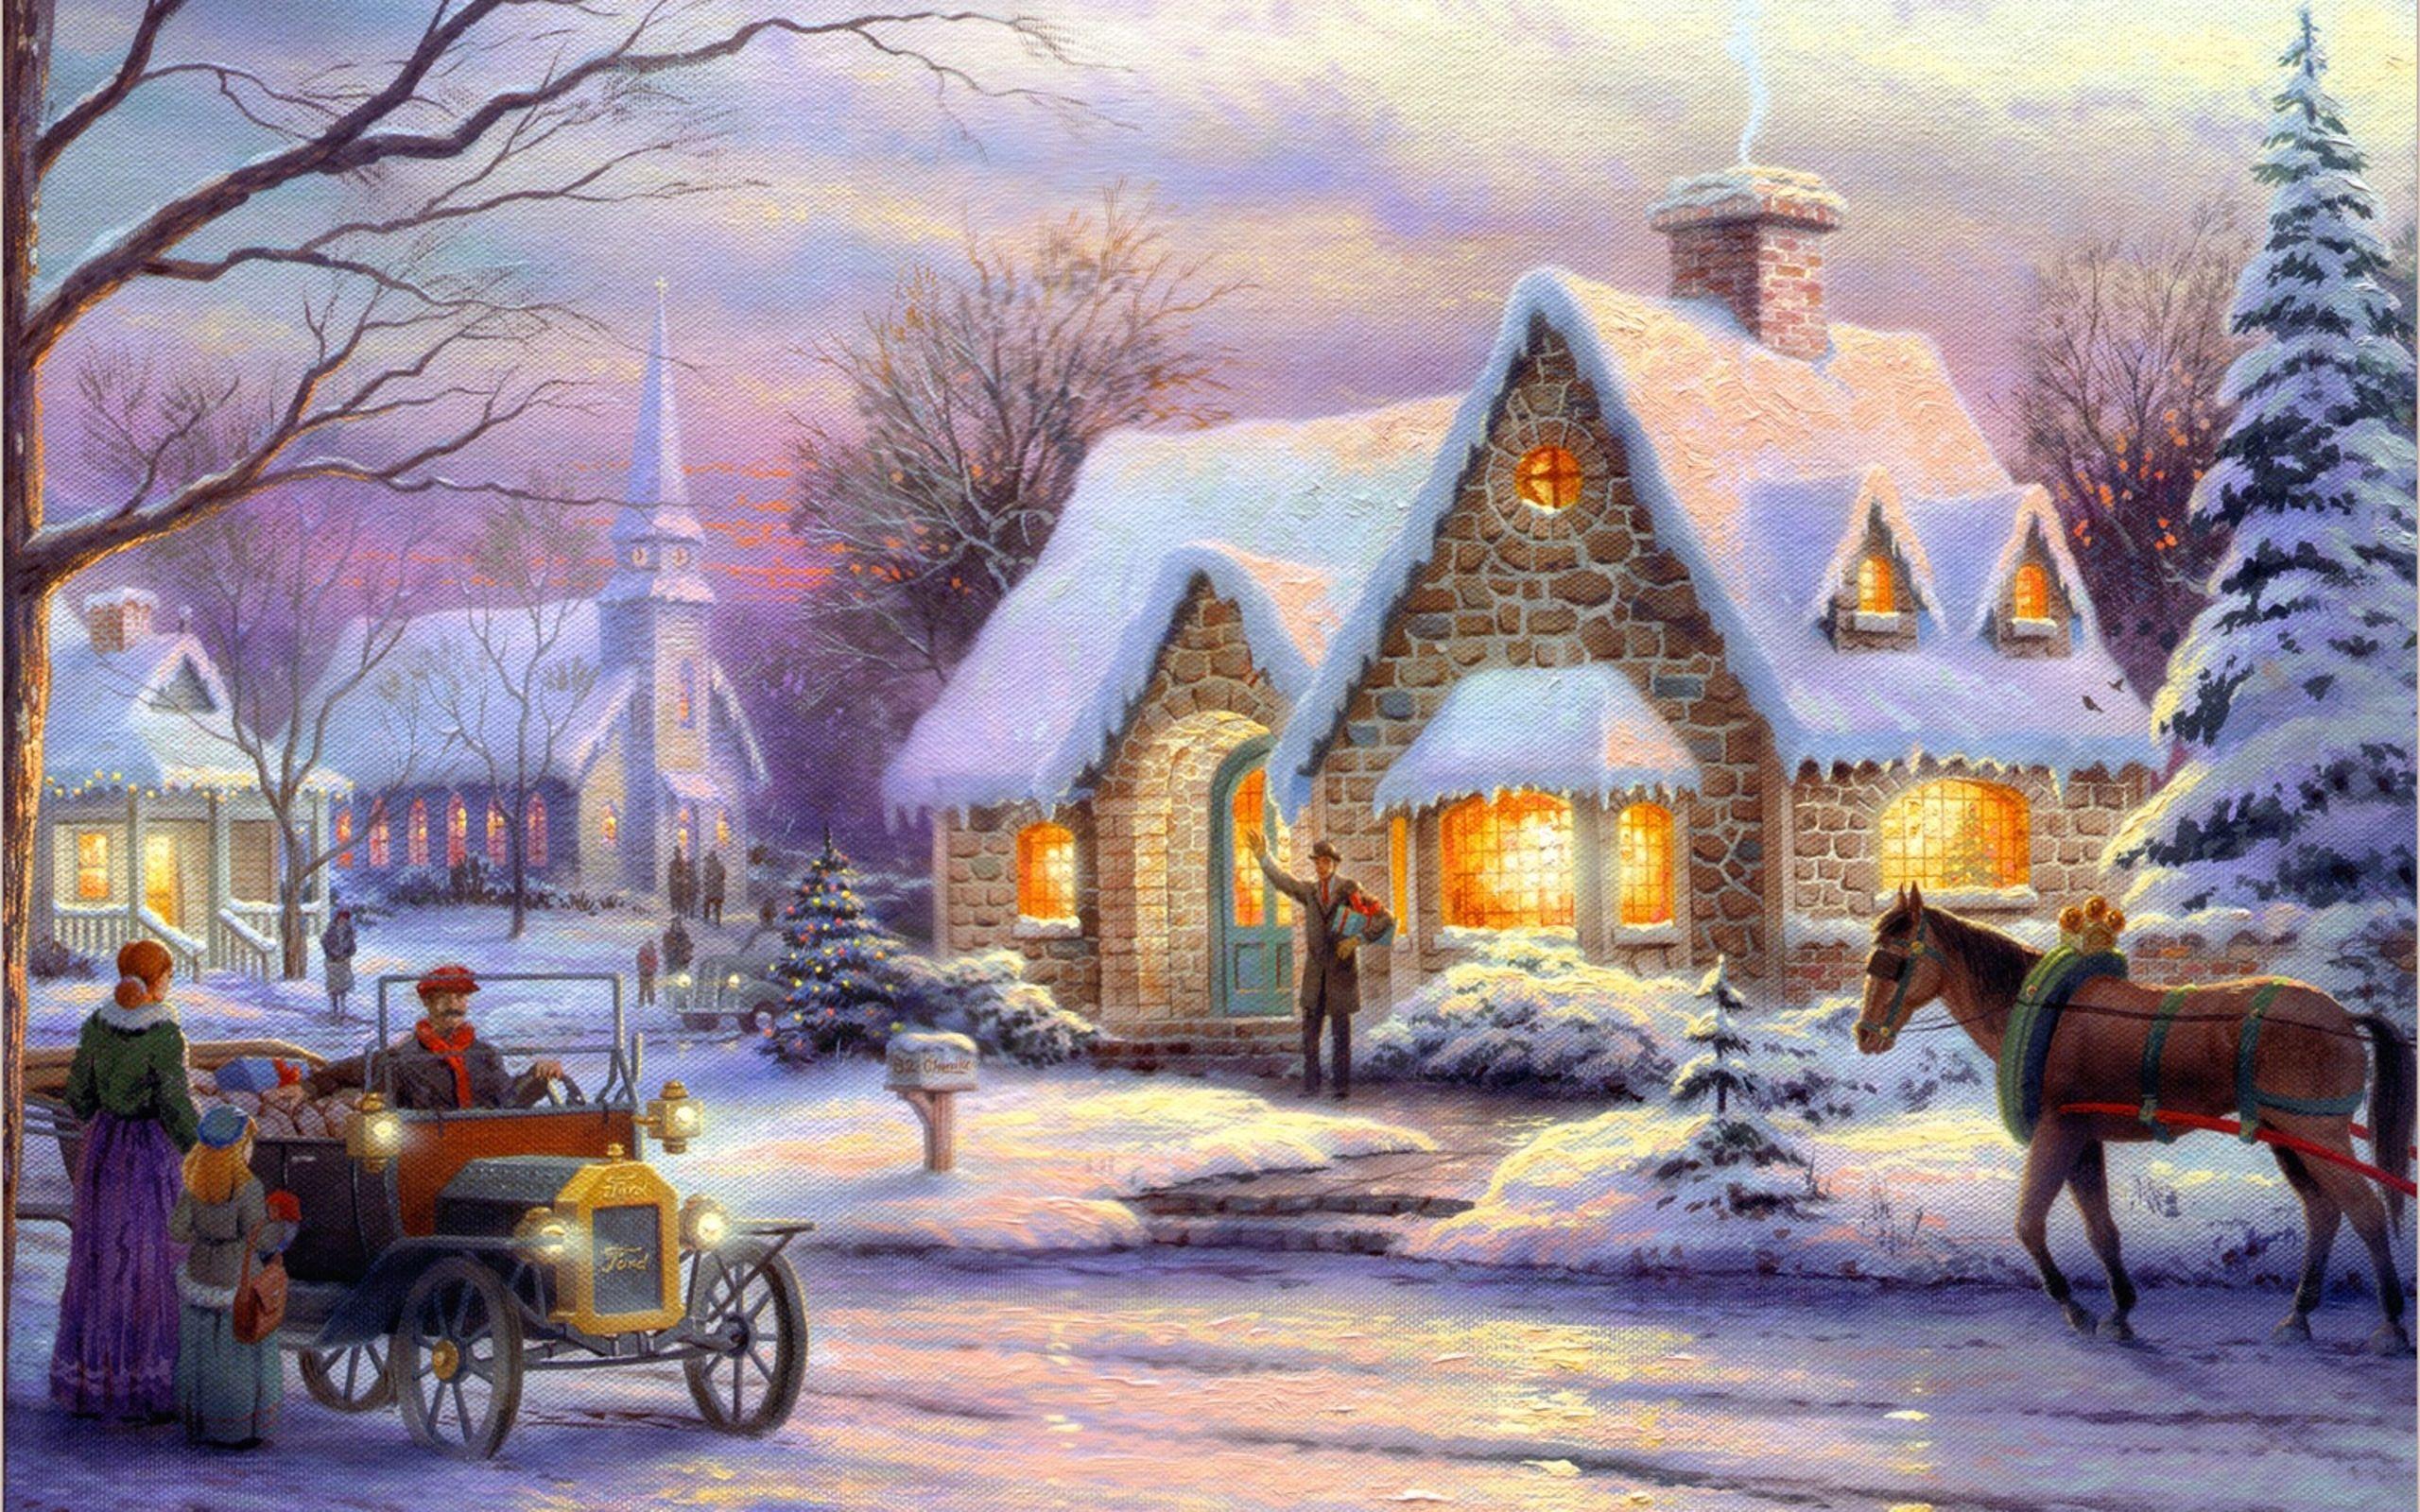 50382-full_christmas-paintings-wallpaper-thomas-kinkade-wallpaper-memories.jpg